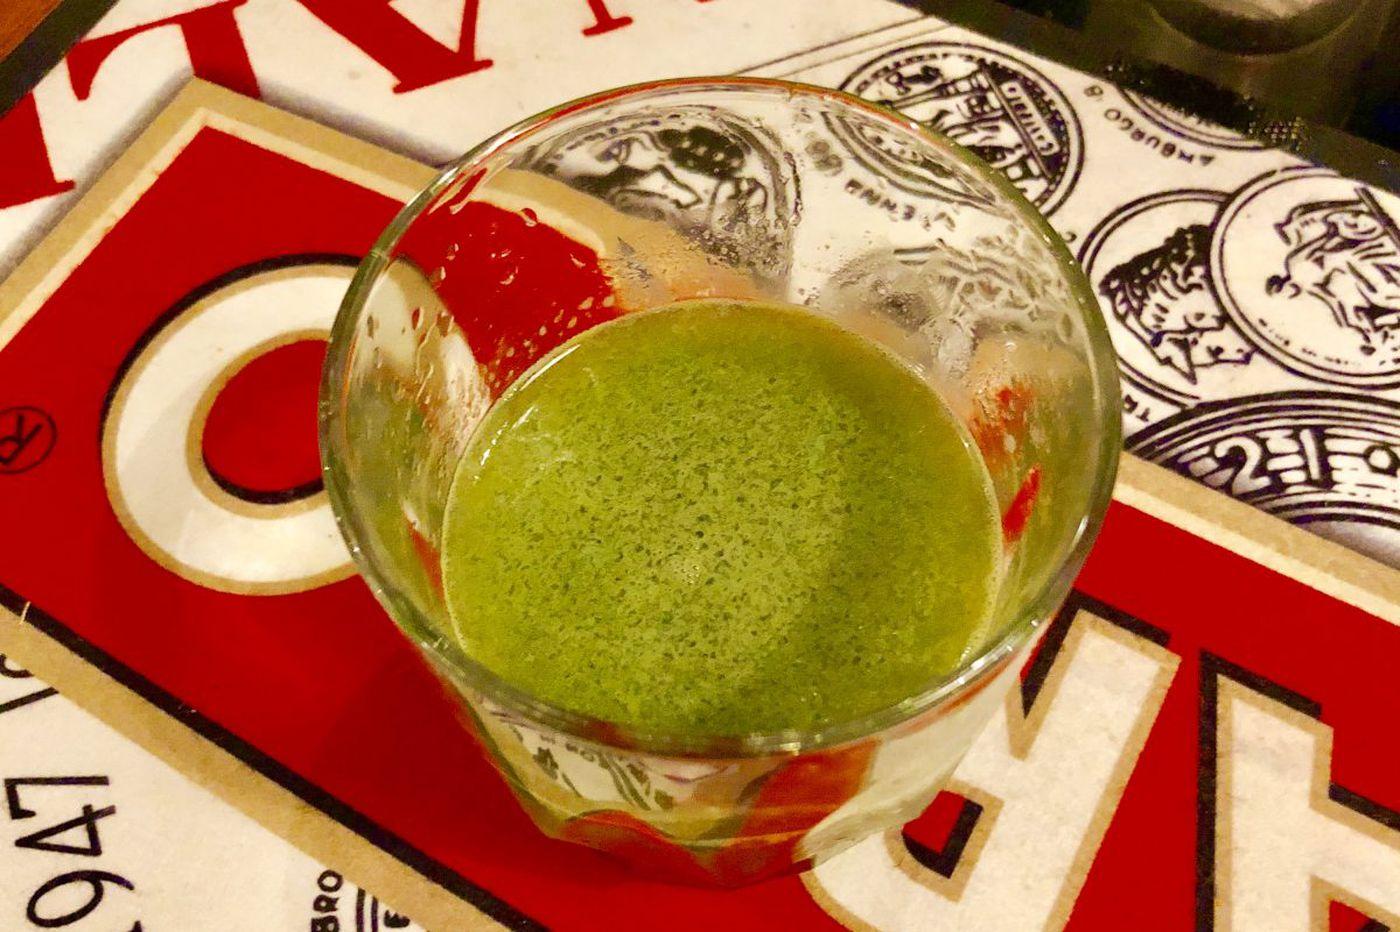 The Gatorade-inspired cocktail that's better than Gatorade